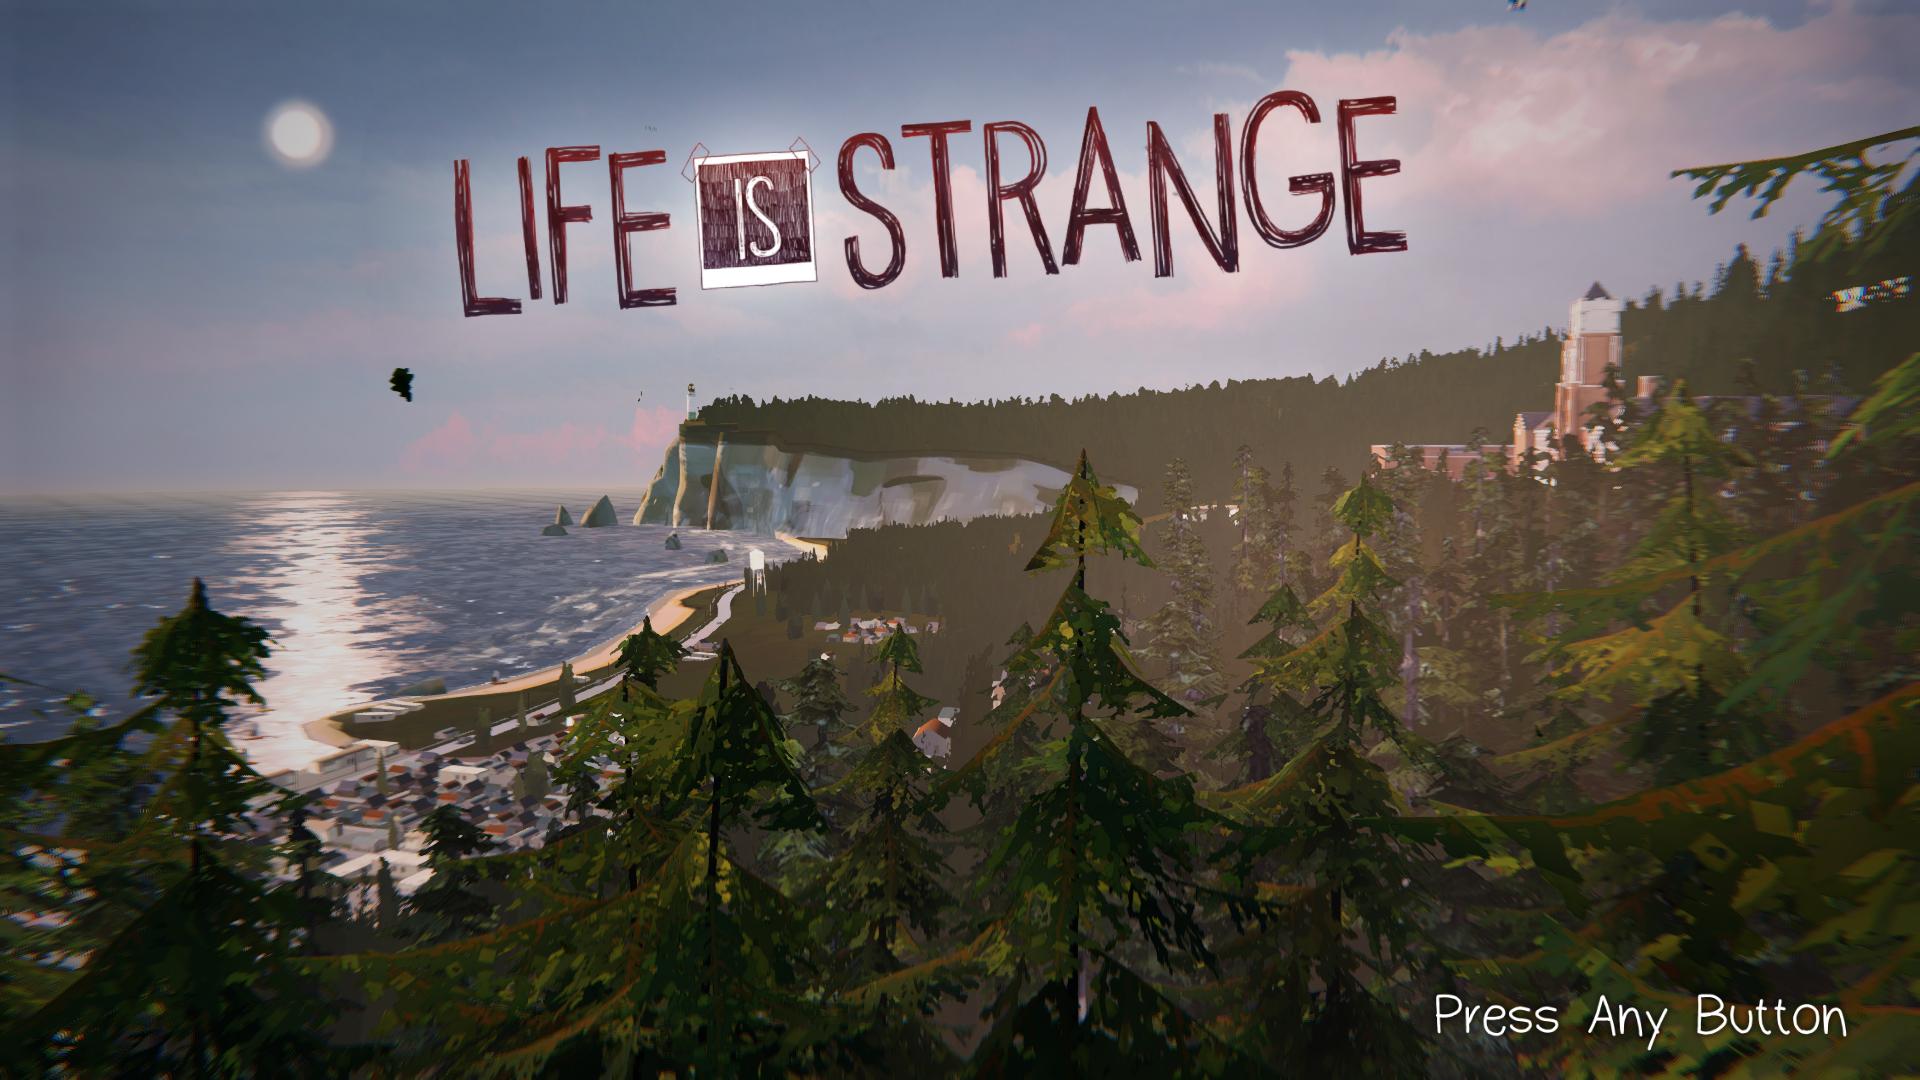 Life is Strange Title